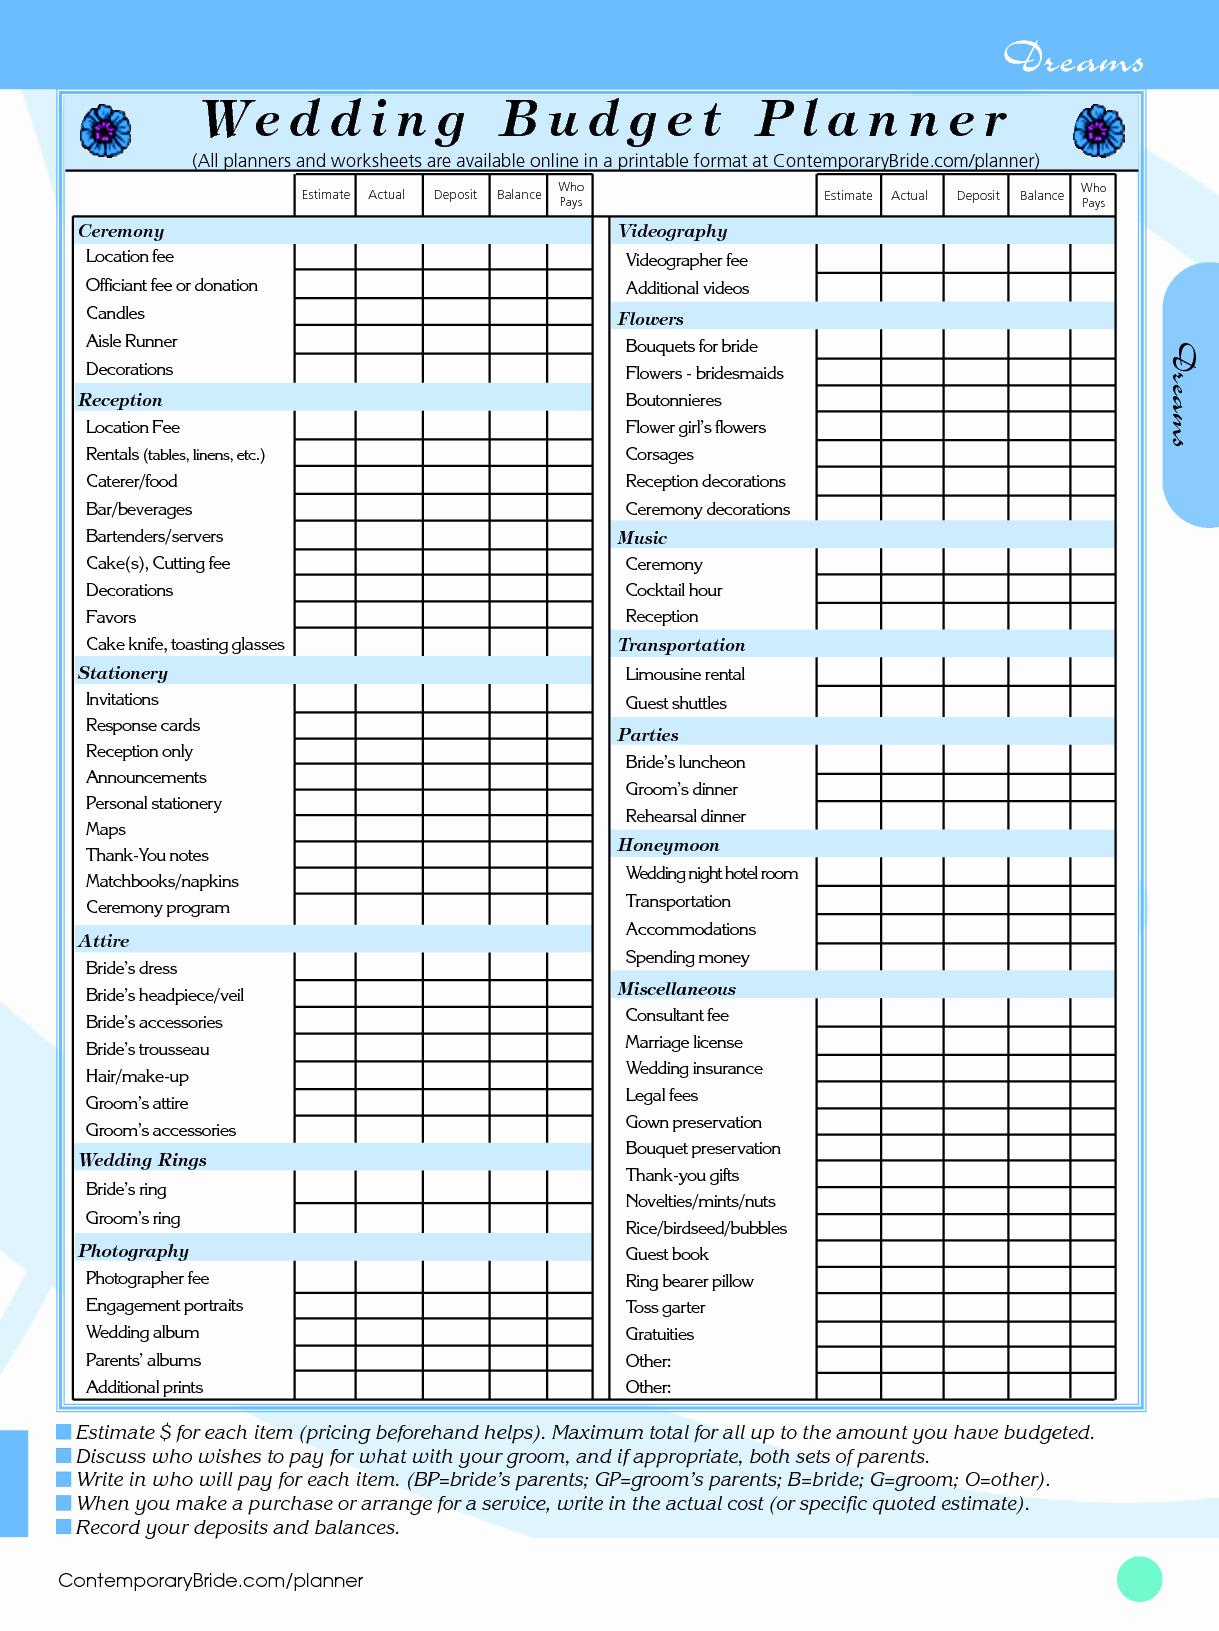 Wedding Planning Budget Template Beautiful 14 Useful Wedding Bud Planners